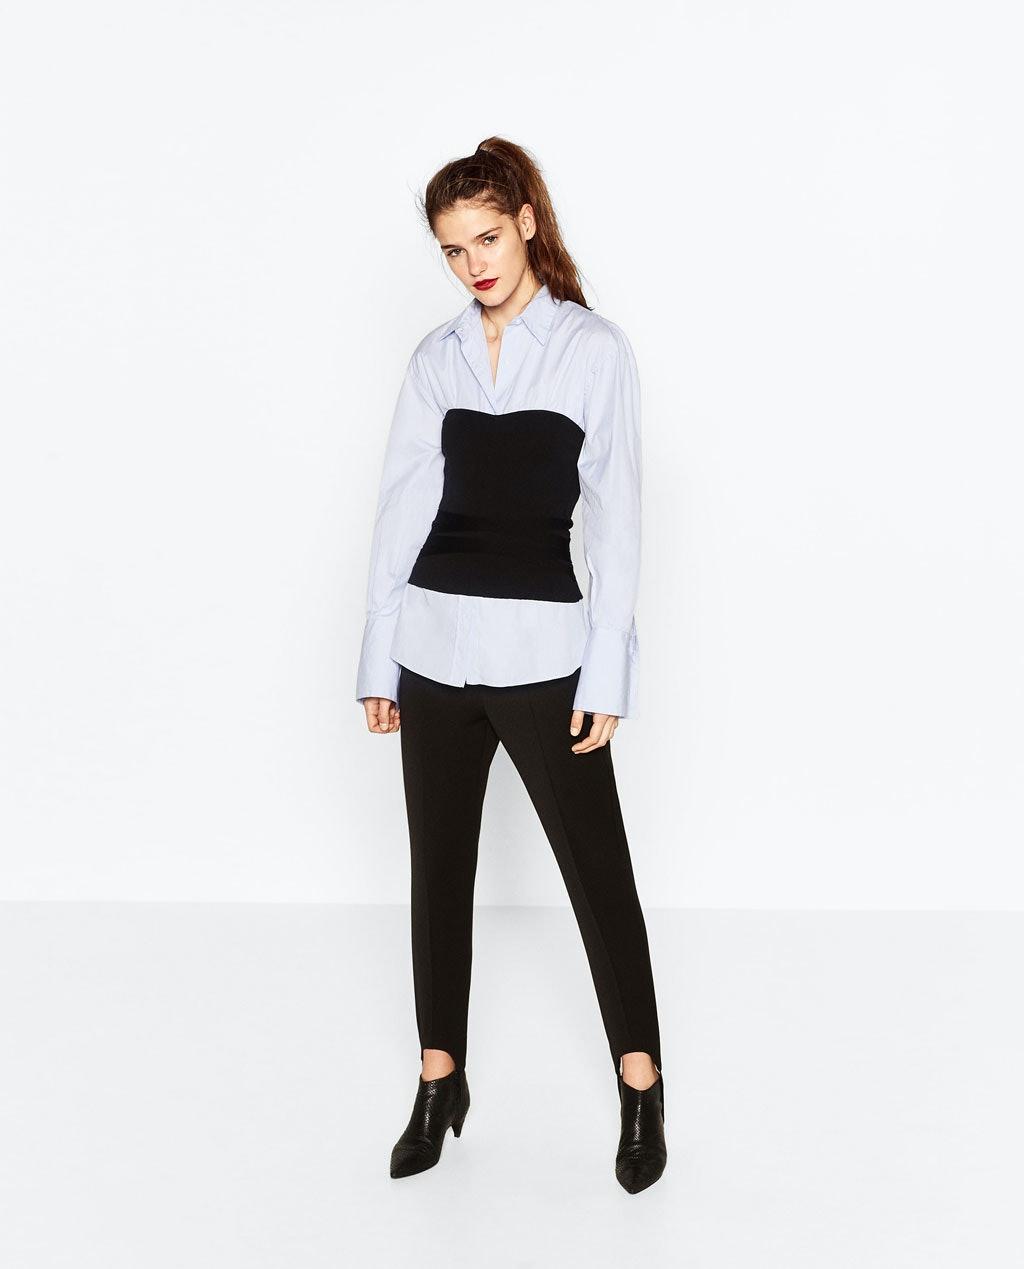 68134e0bbd 13 Zara Items Every Fashion Girl Owns